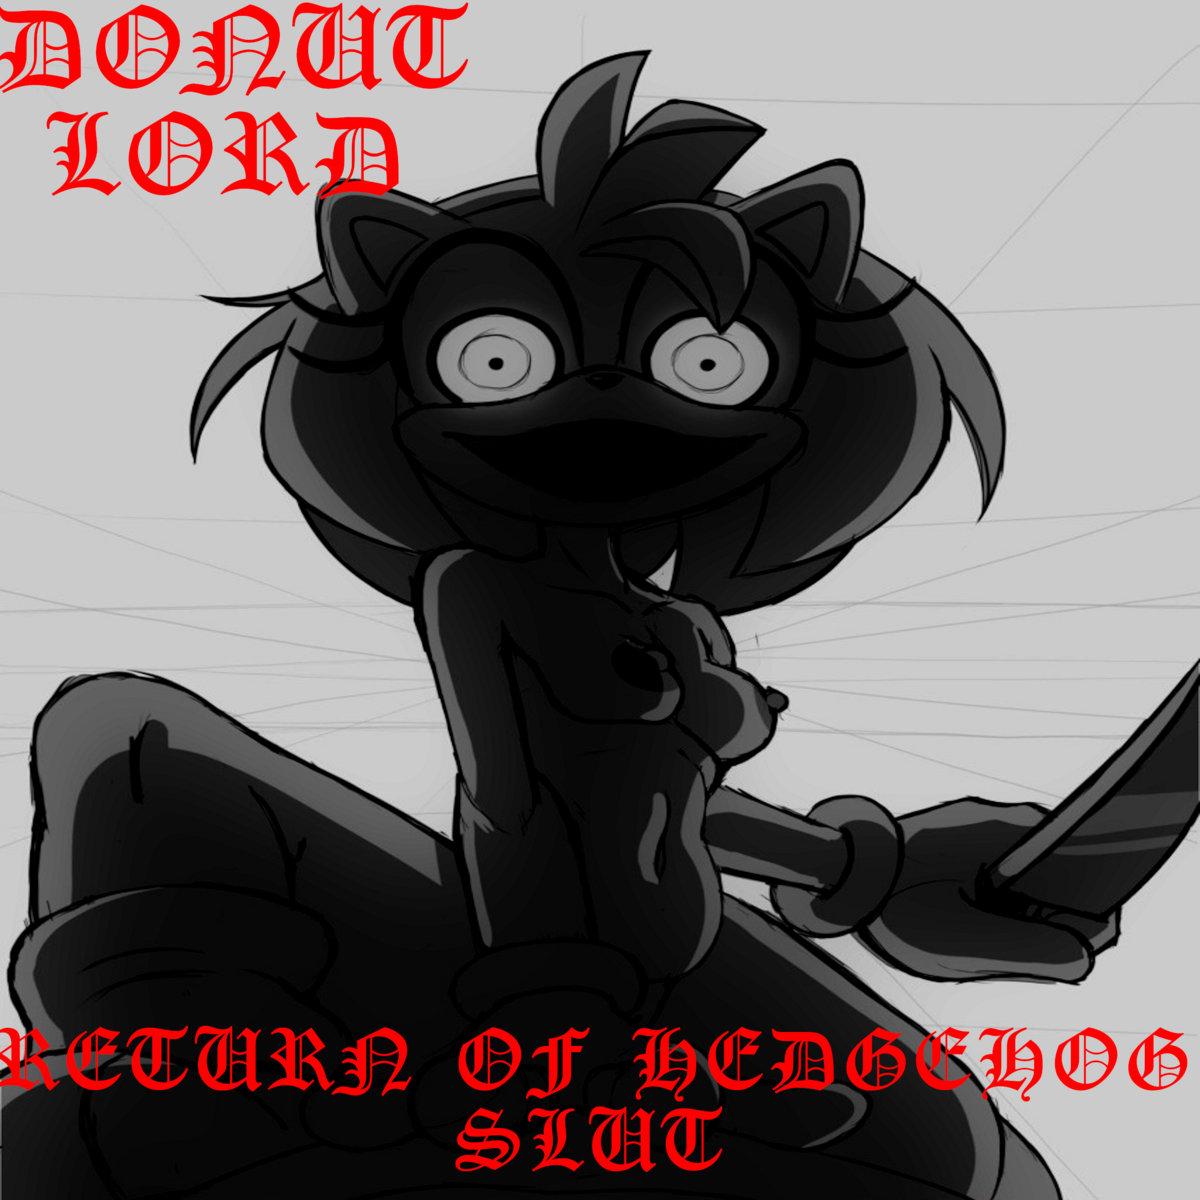 Donut Lord - The Return of Hedgehog Slut